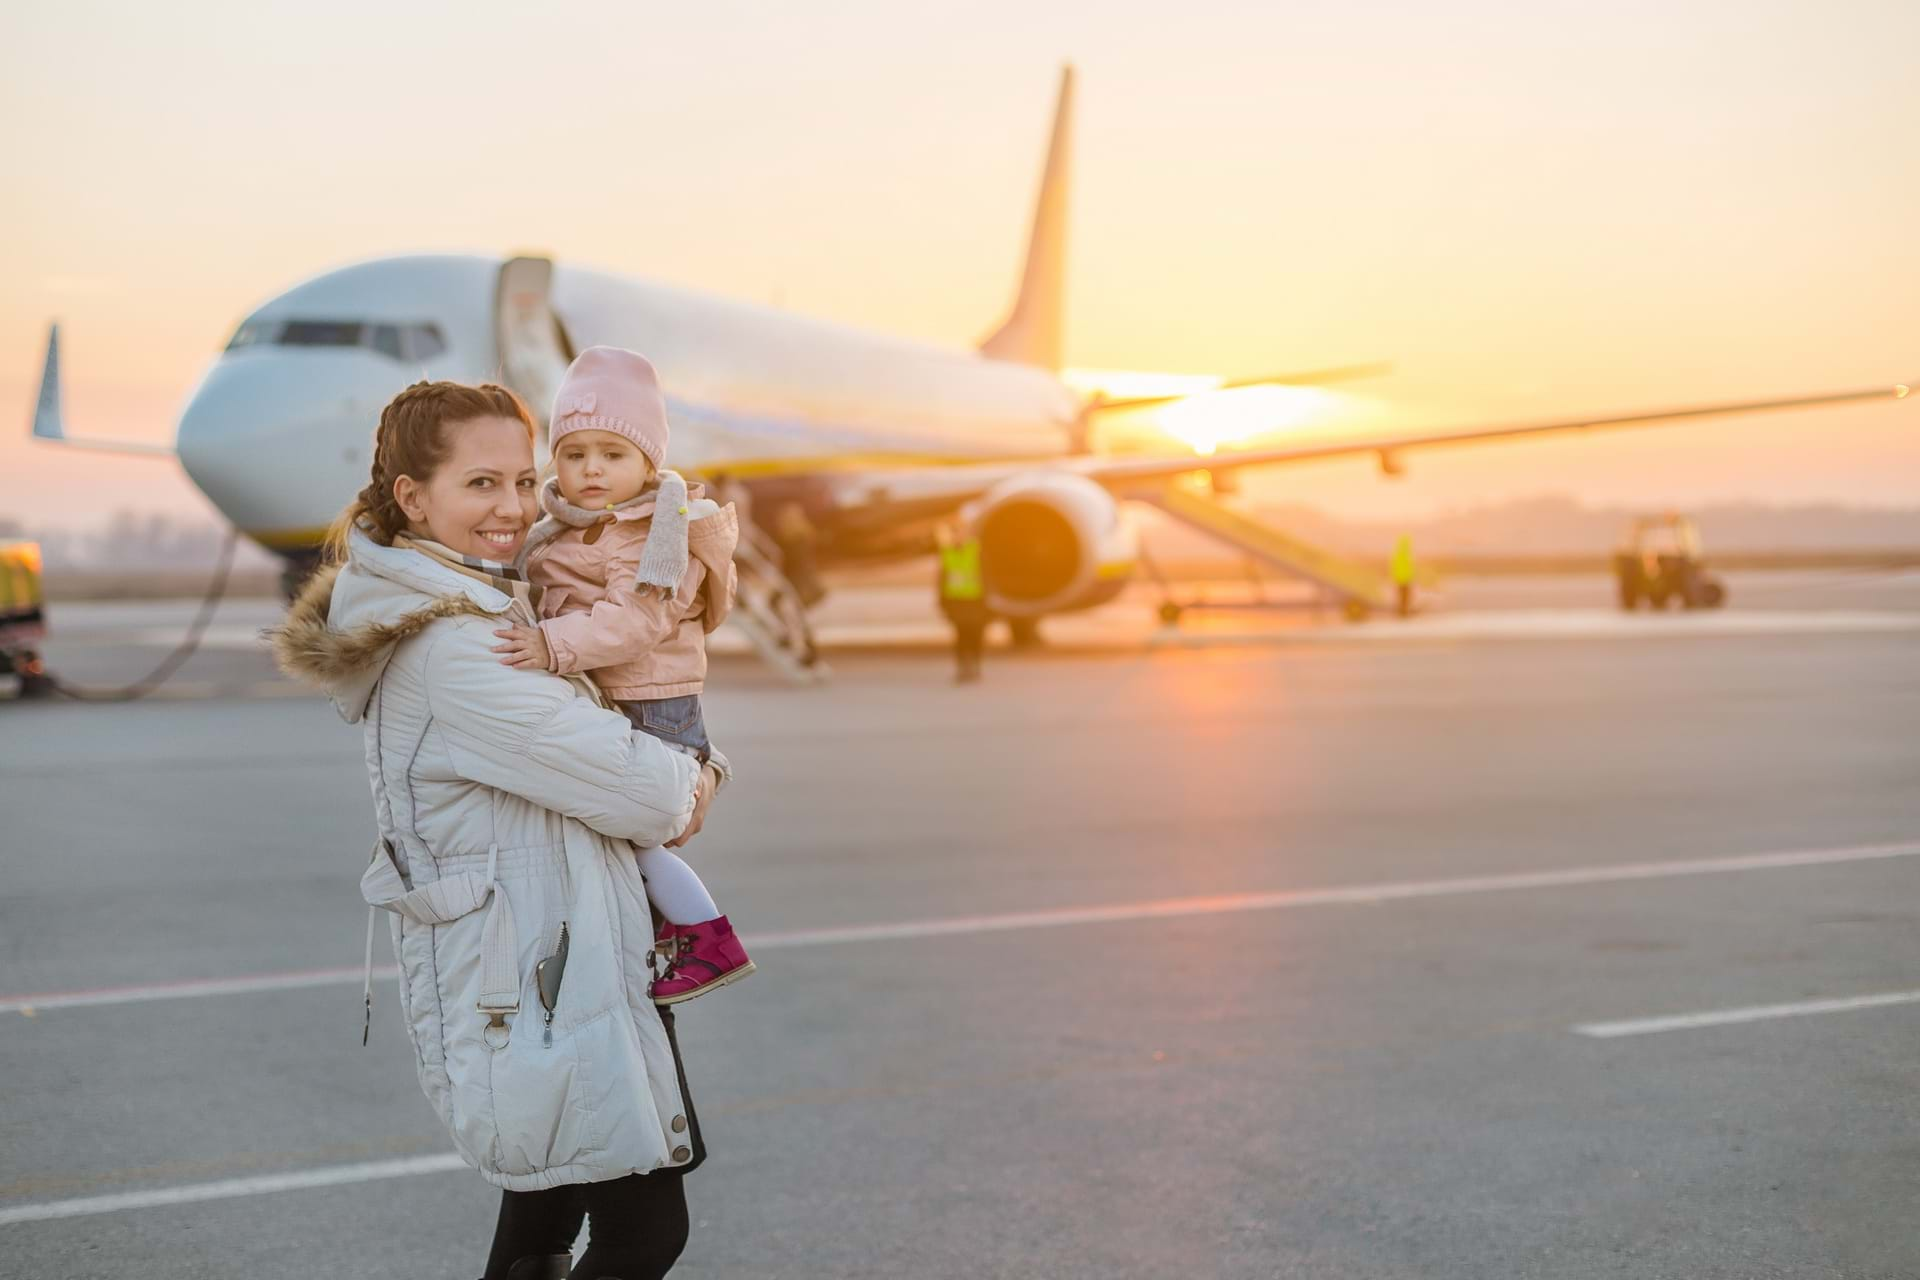 guérin car rental lisbon airport